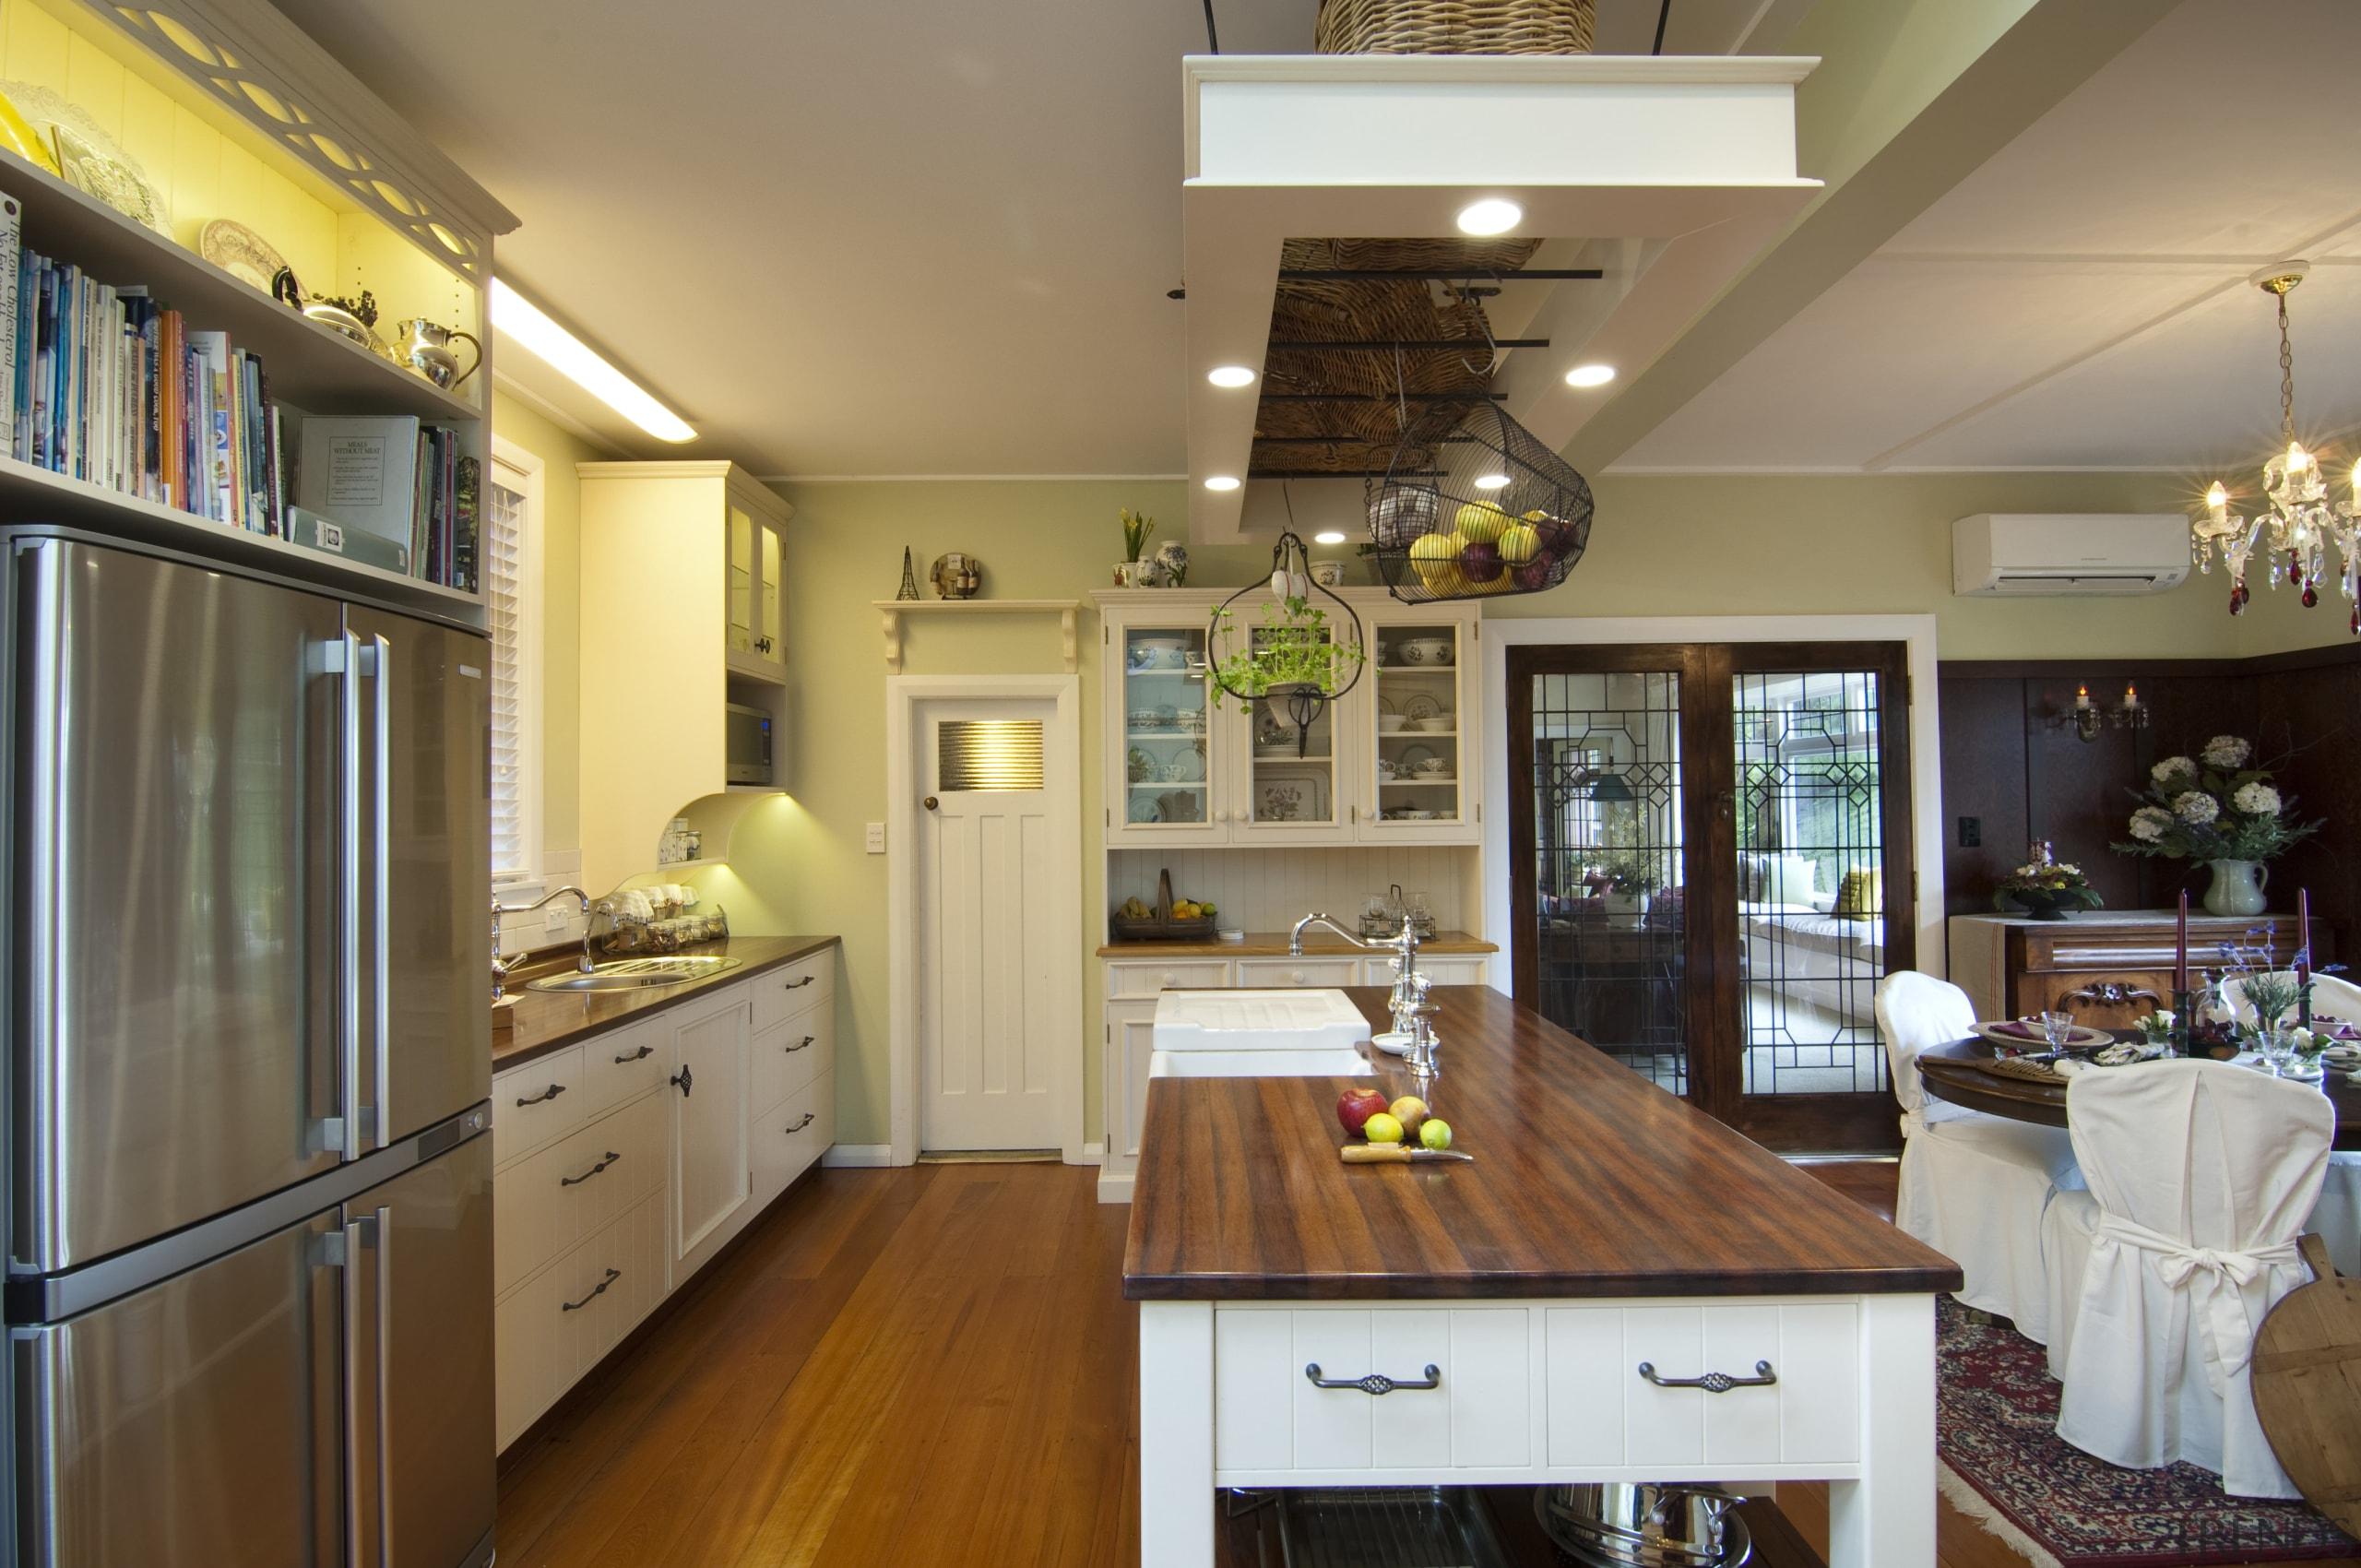 refrigerator, island and rangehood, floor and sink ceiling, countertop, interior design, kitchen, living room, real estate, room, brown